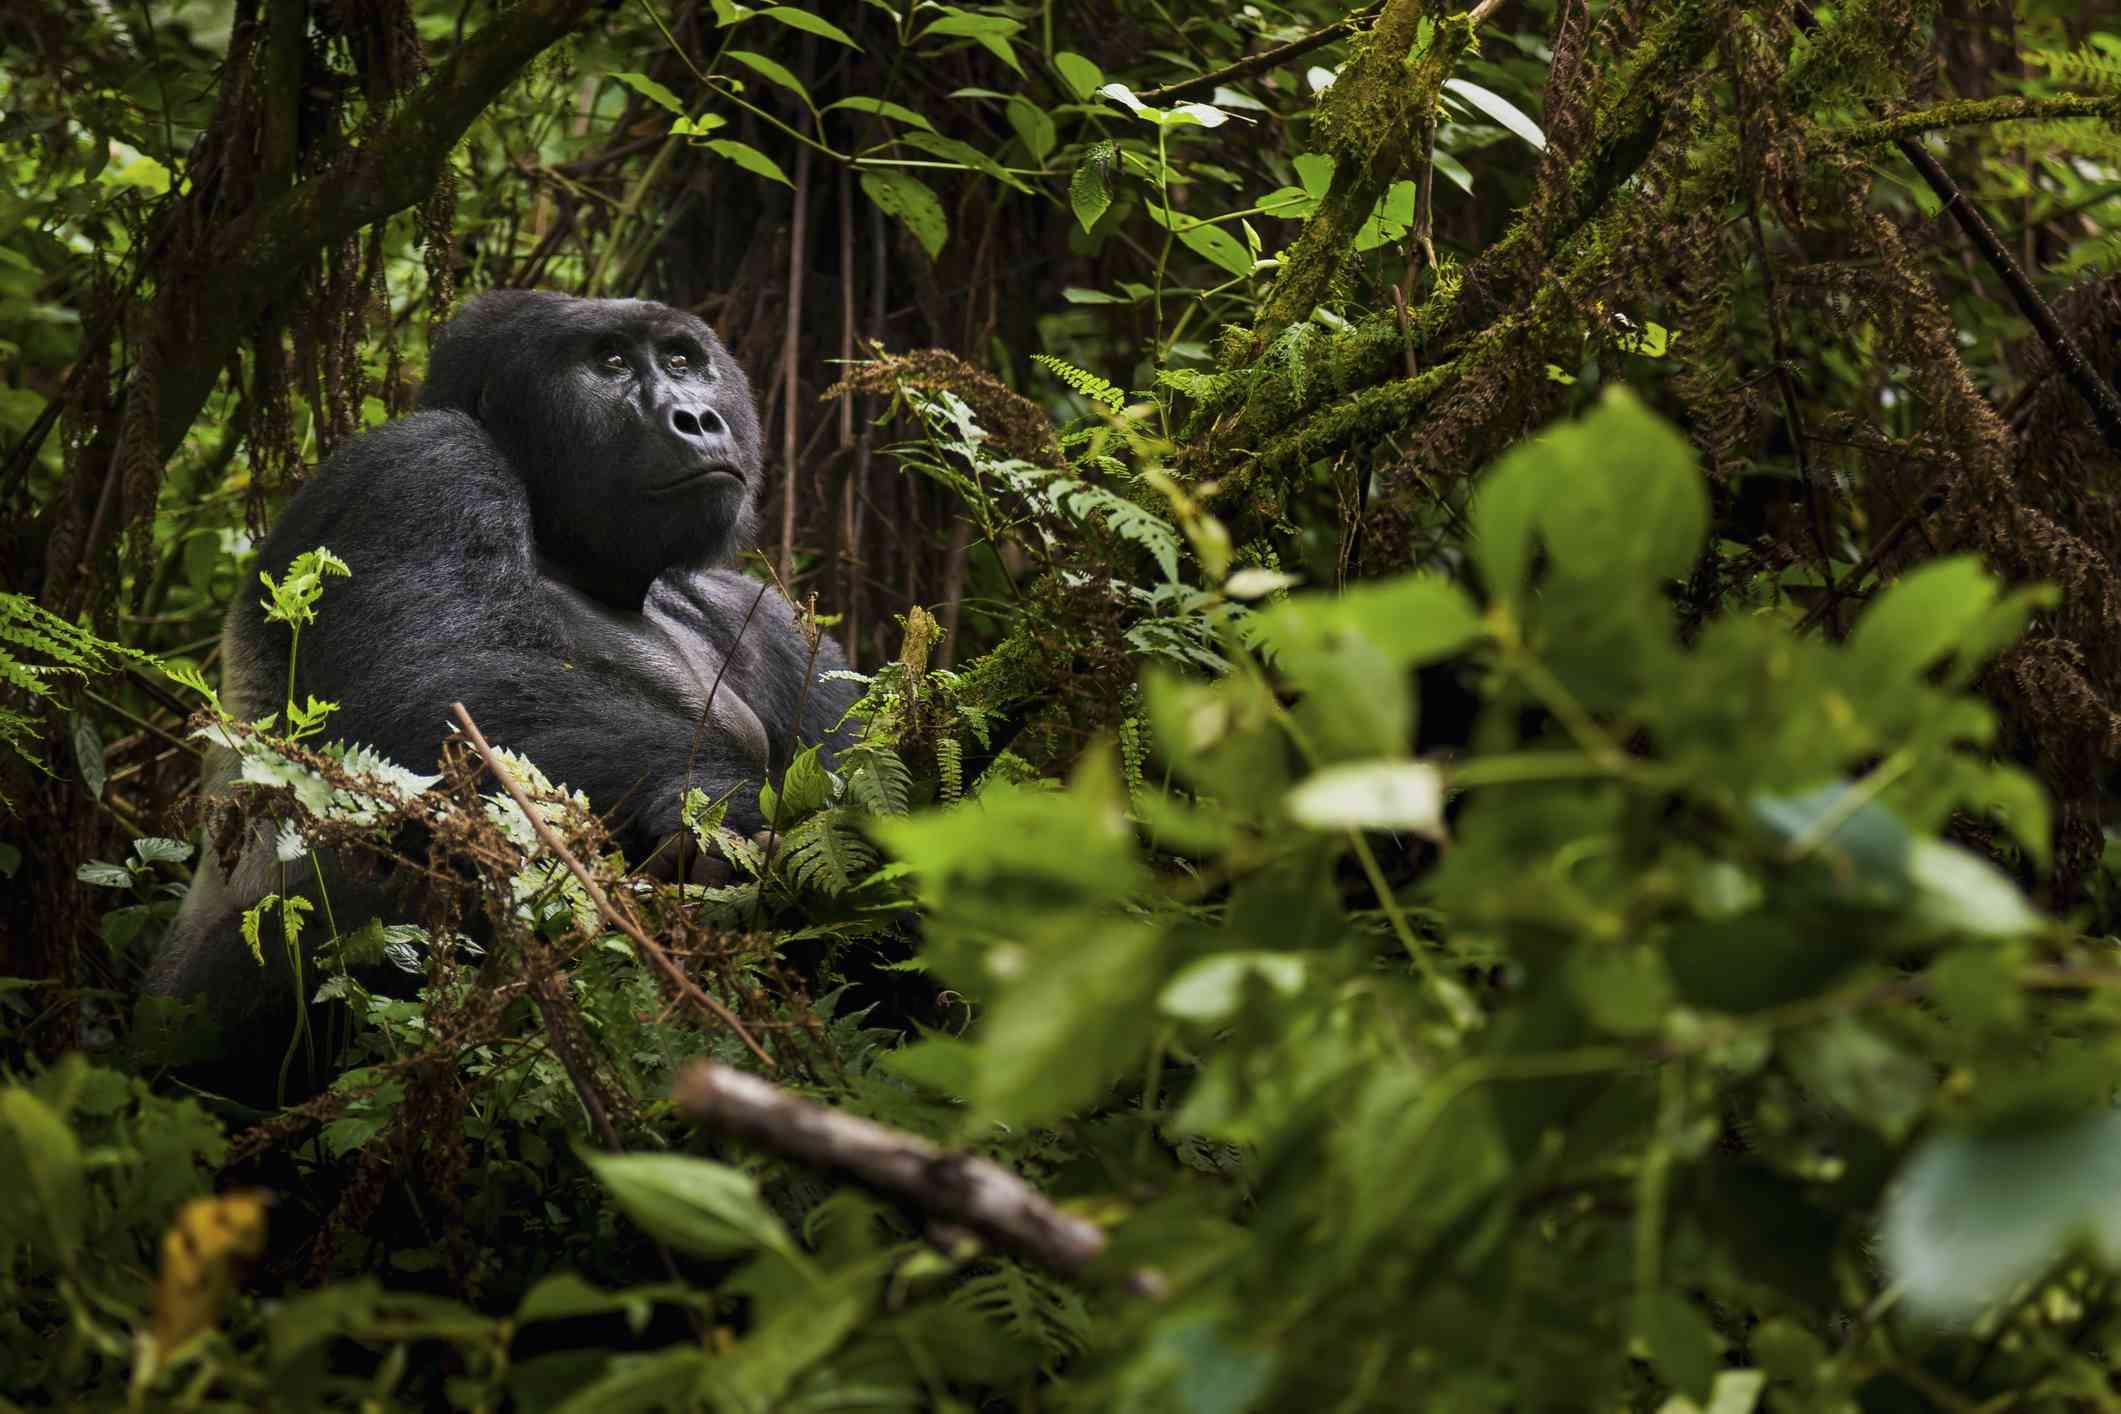 Gorilla in the jungle, Volcanoes National Park